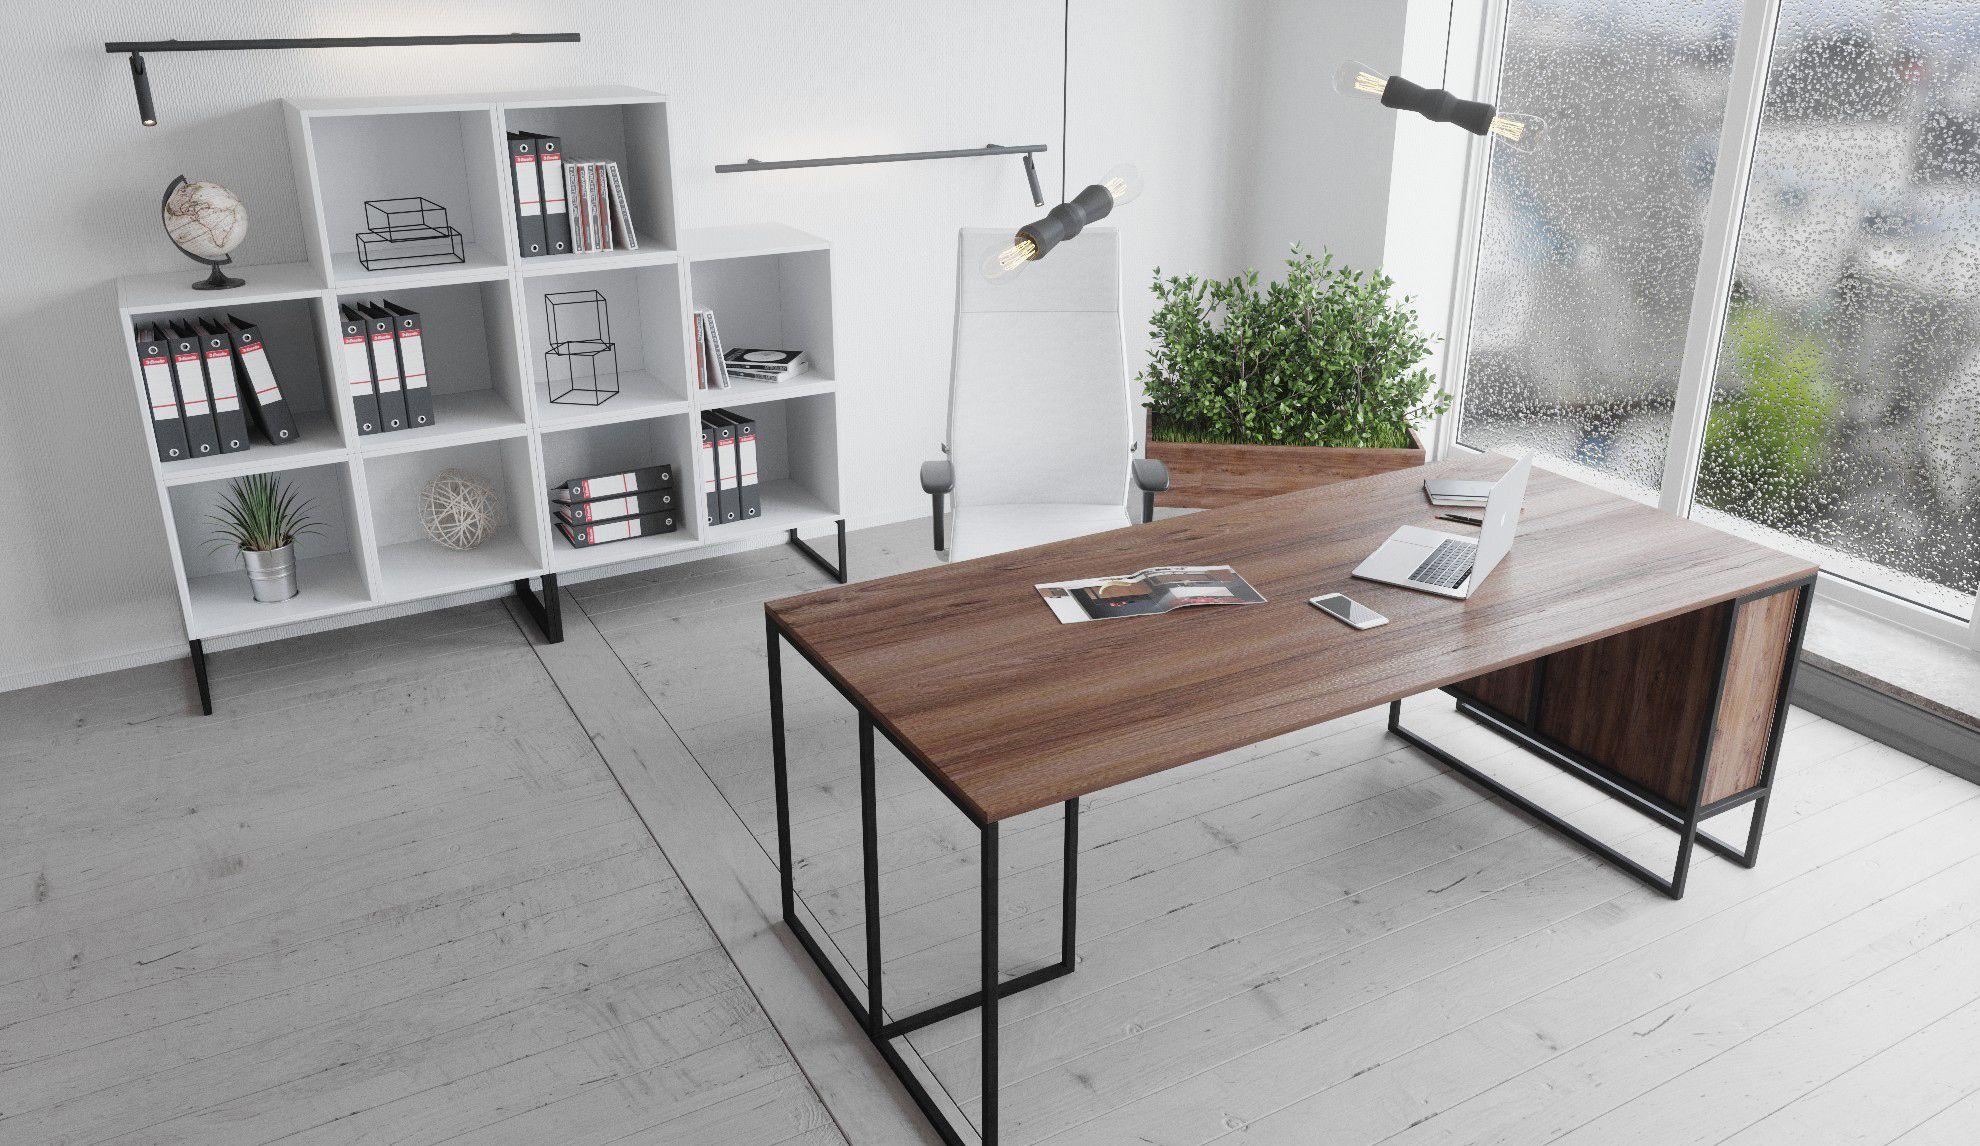 meble biurowe,meble do biura,nowoczesne meble